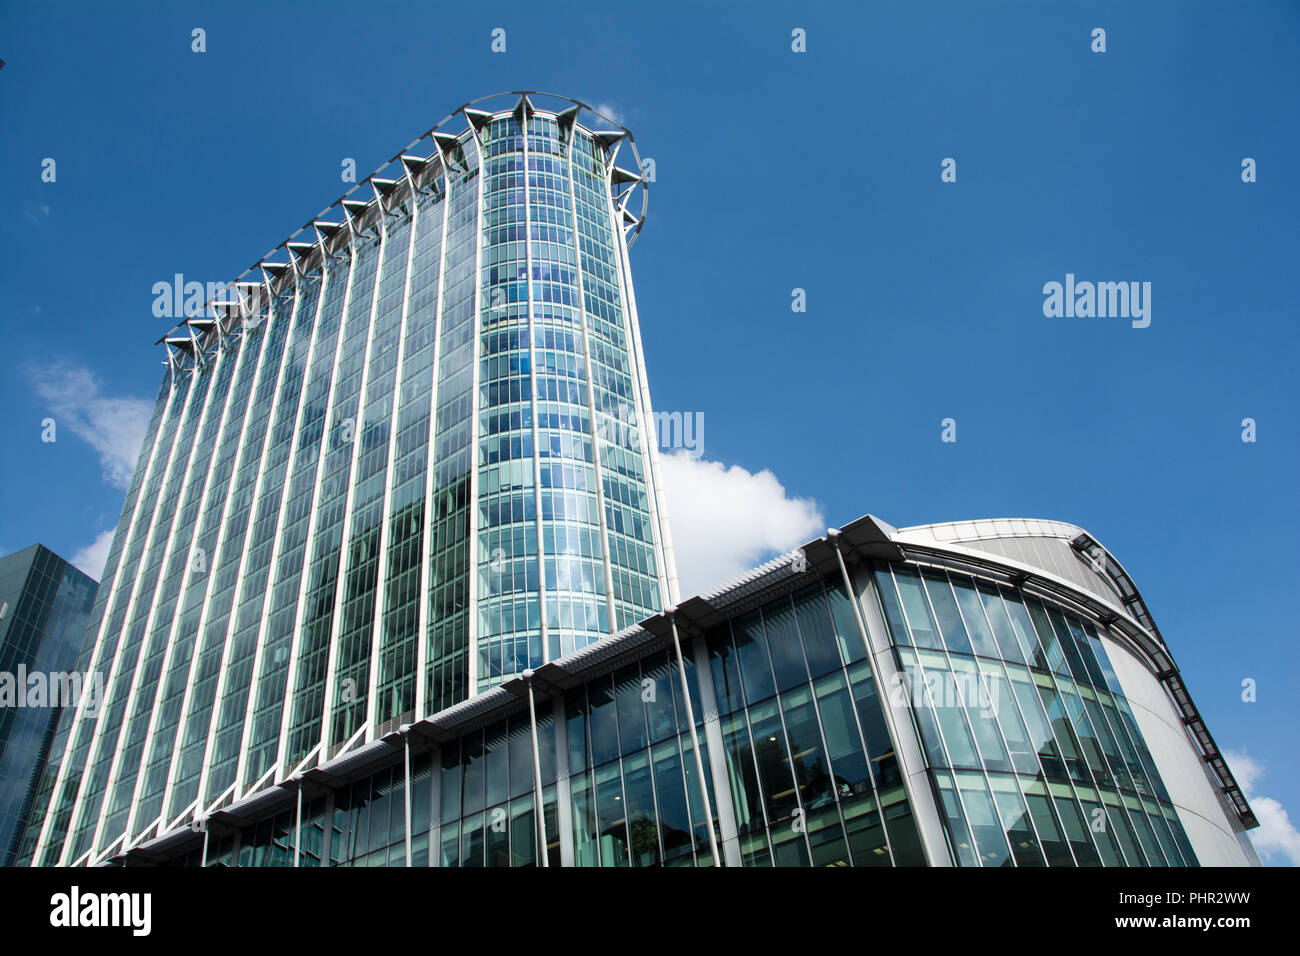 CityPoint, from Moor Lane, designed by architect Santiago Calatrava, on Ropemaker Street, London, EC2, UK - Stock Image